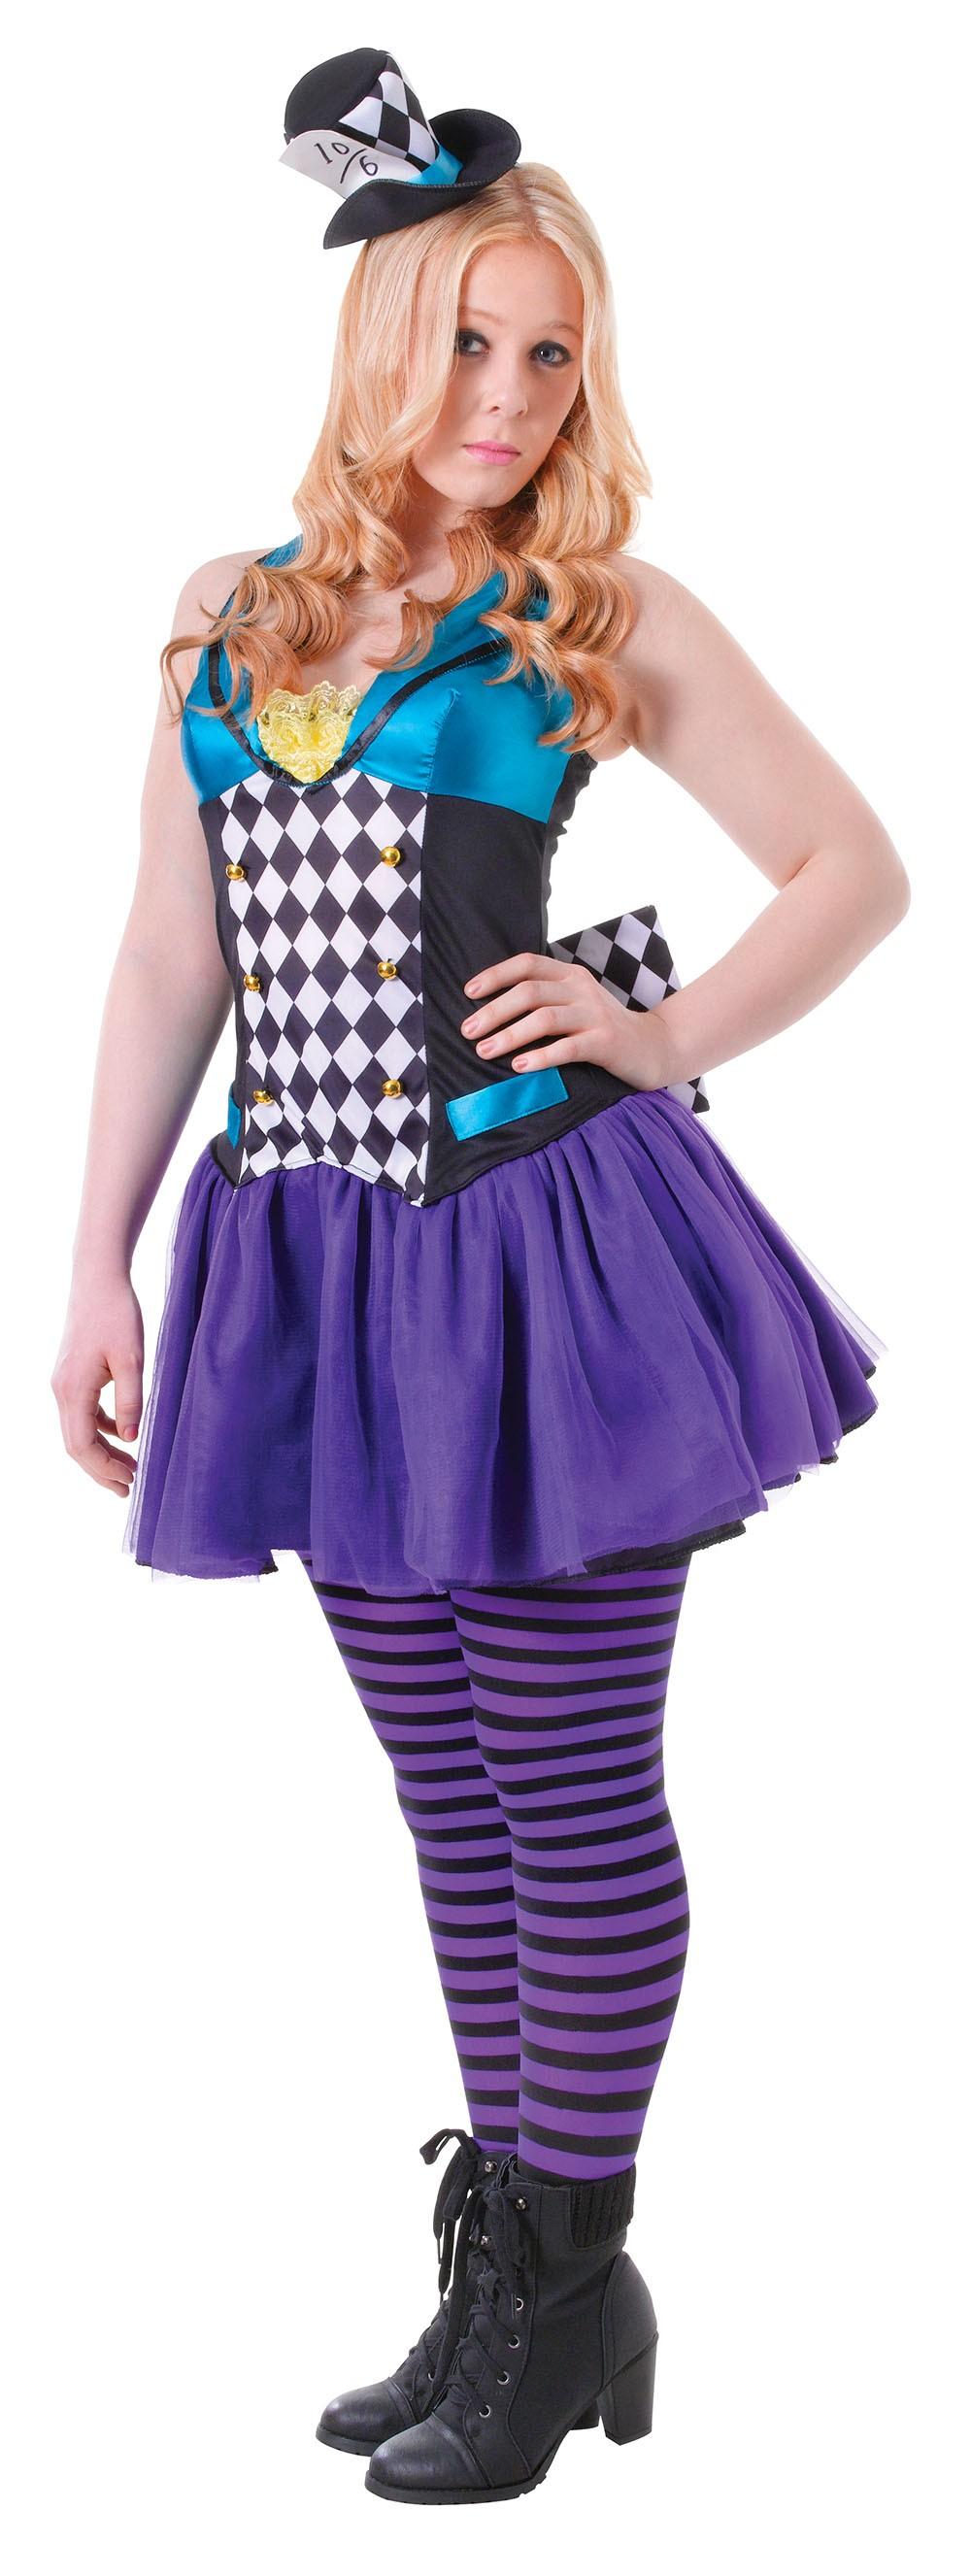 Mad Hatter  costume Adult Fancy Dress